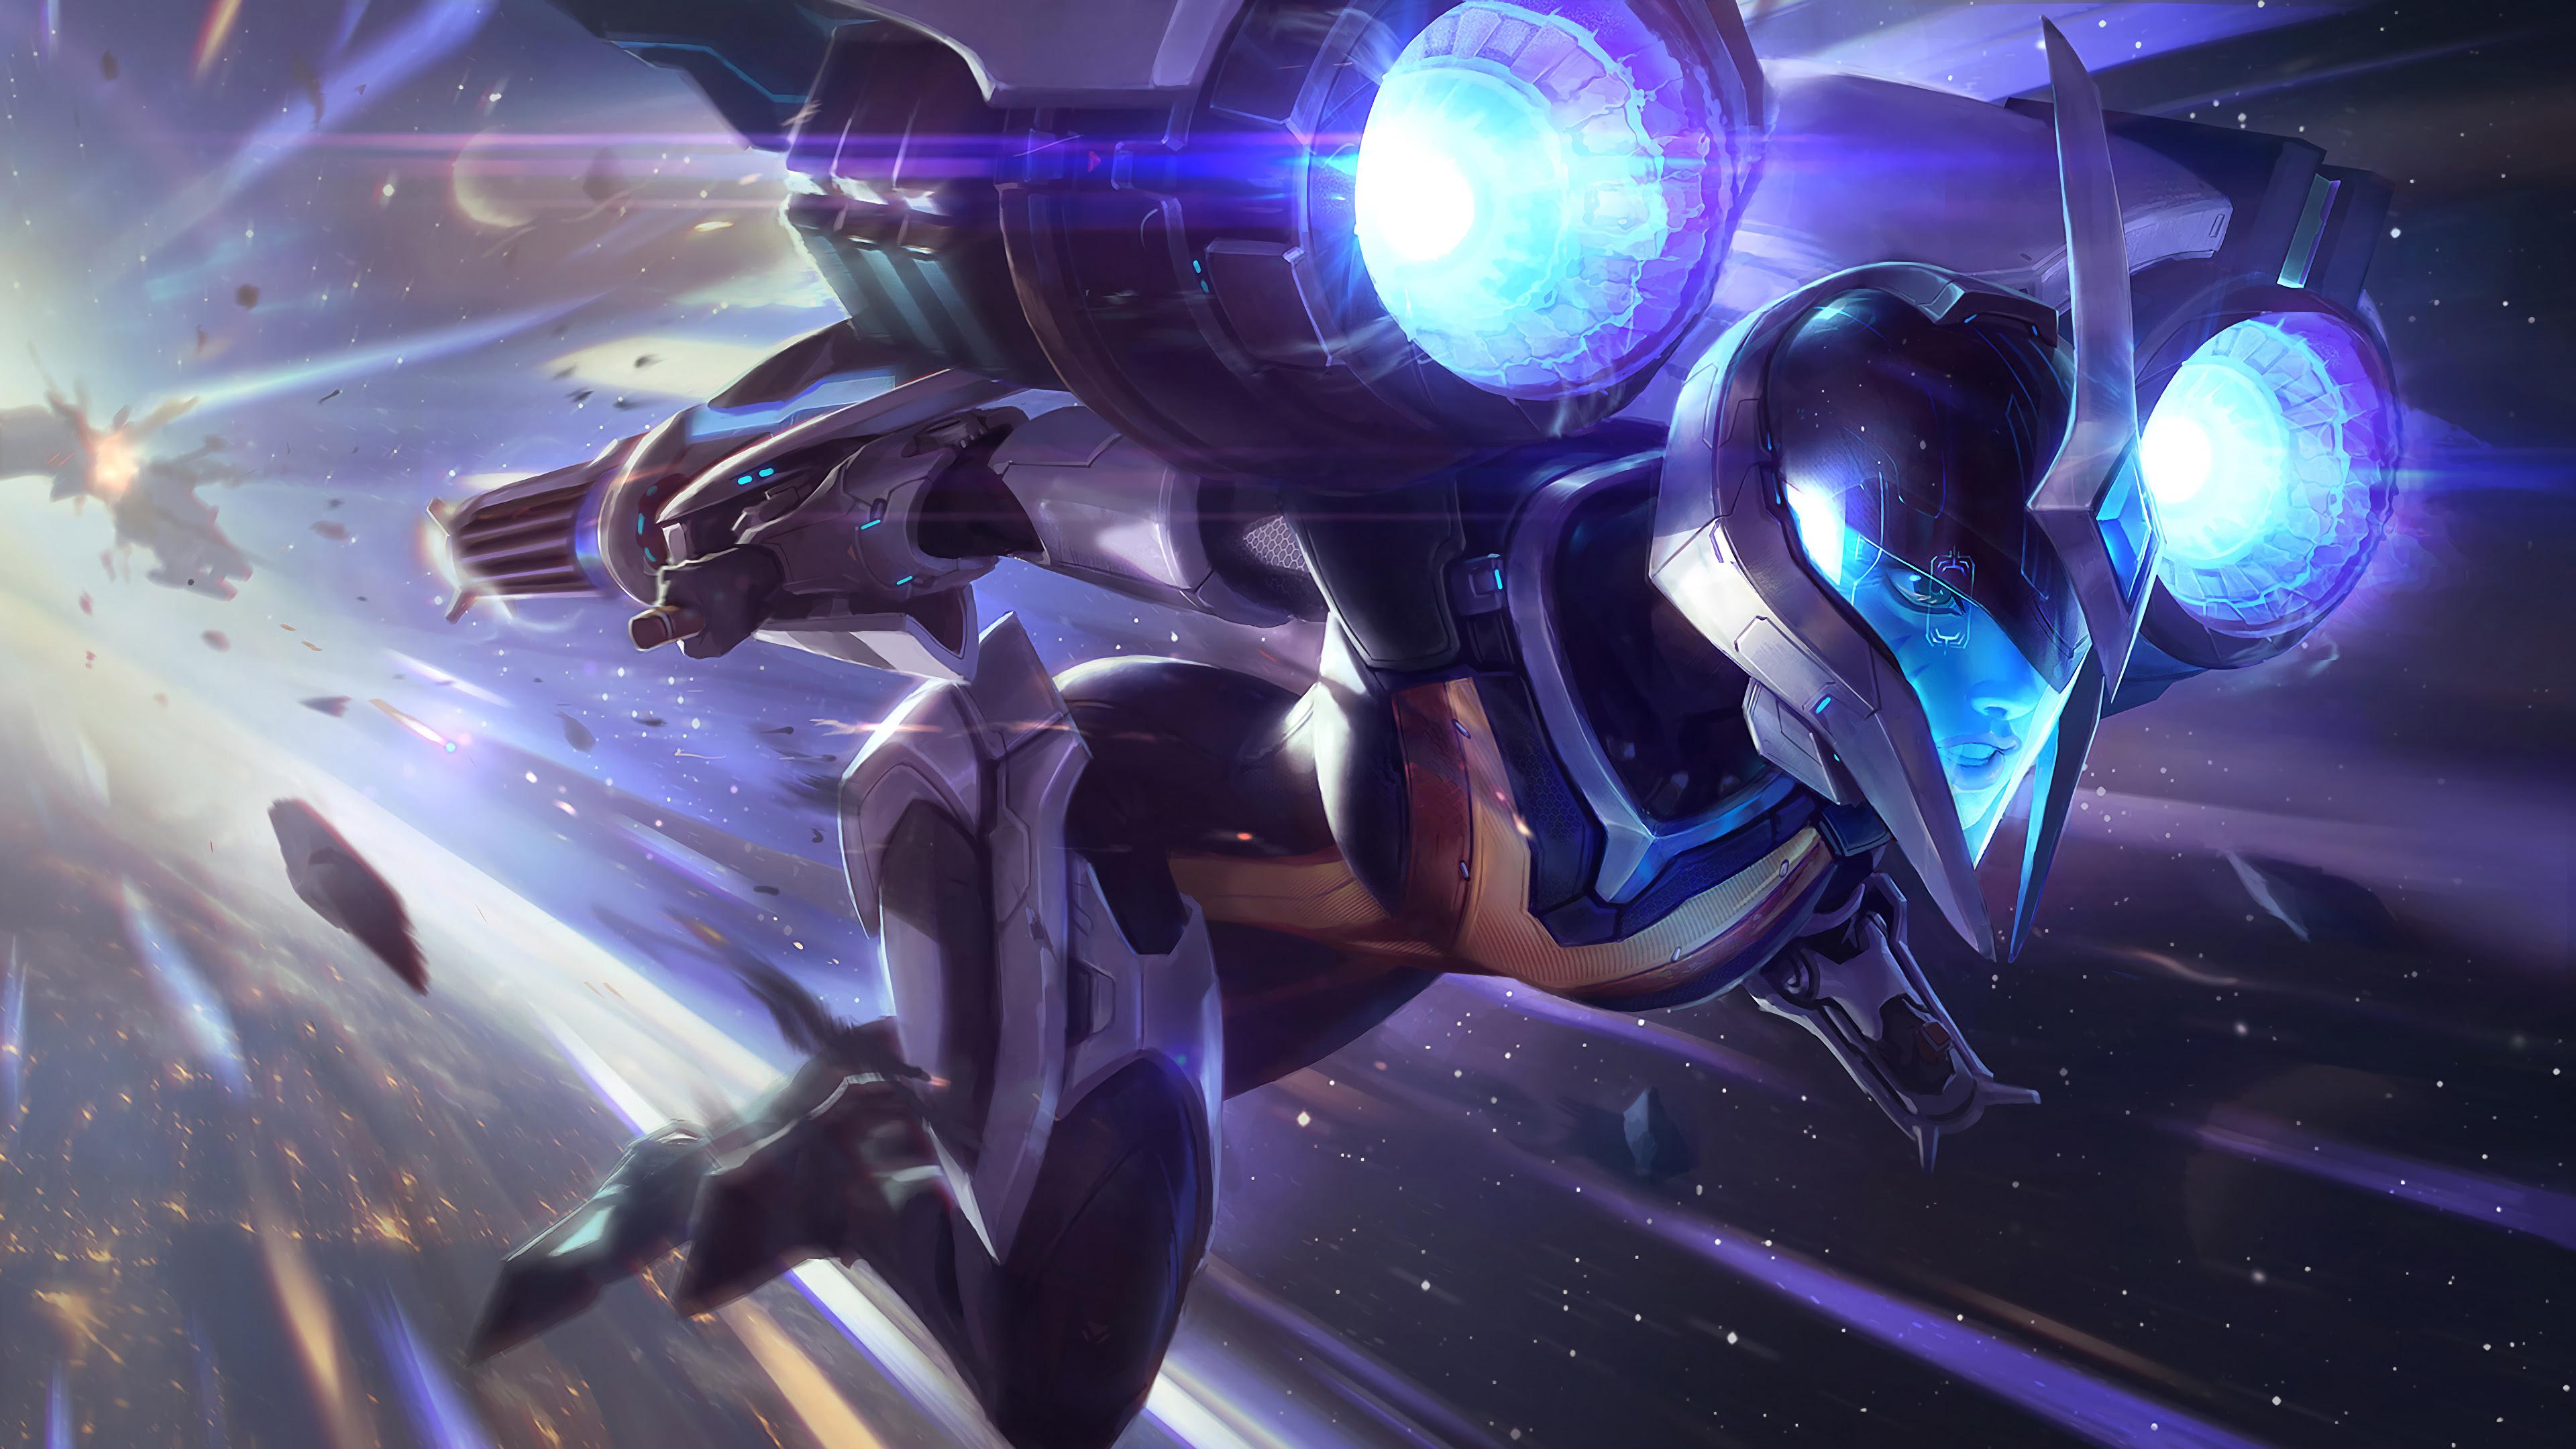 Kai Sa League Of Legends 4k Wallpapers Hd Wallpapers